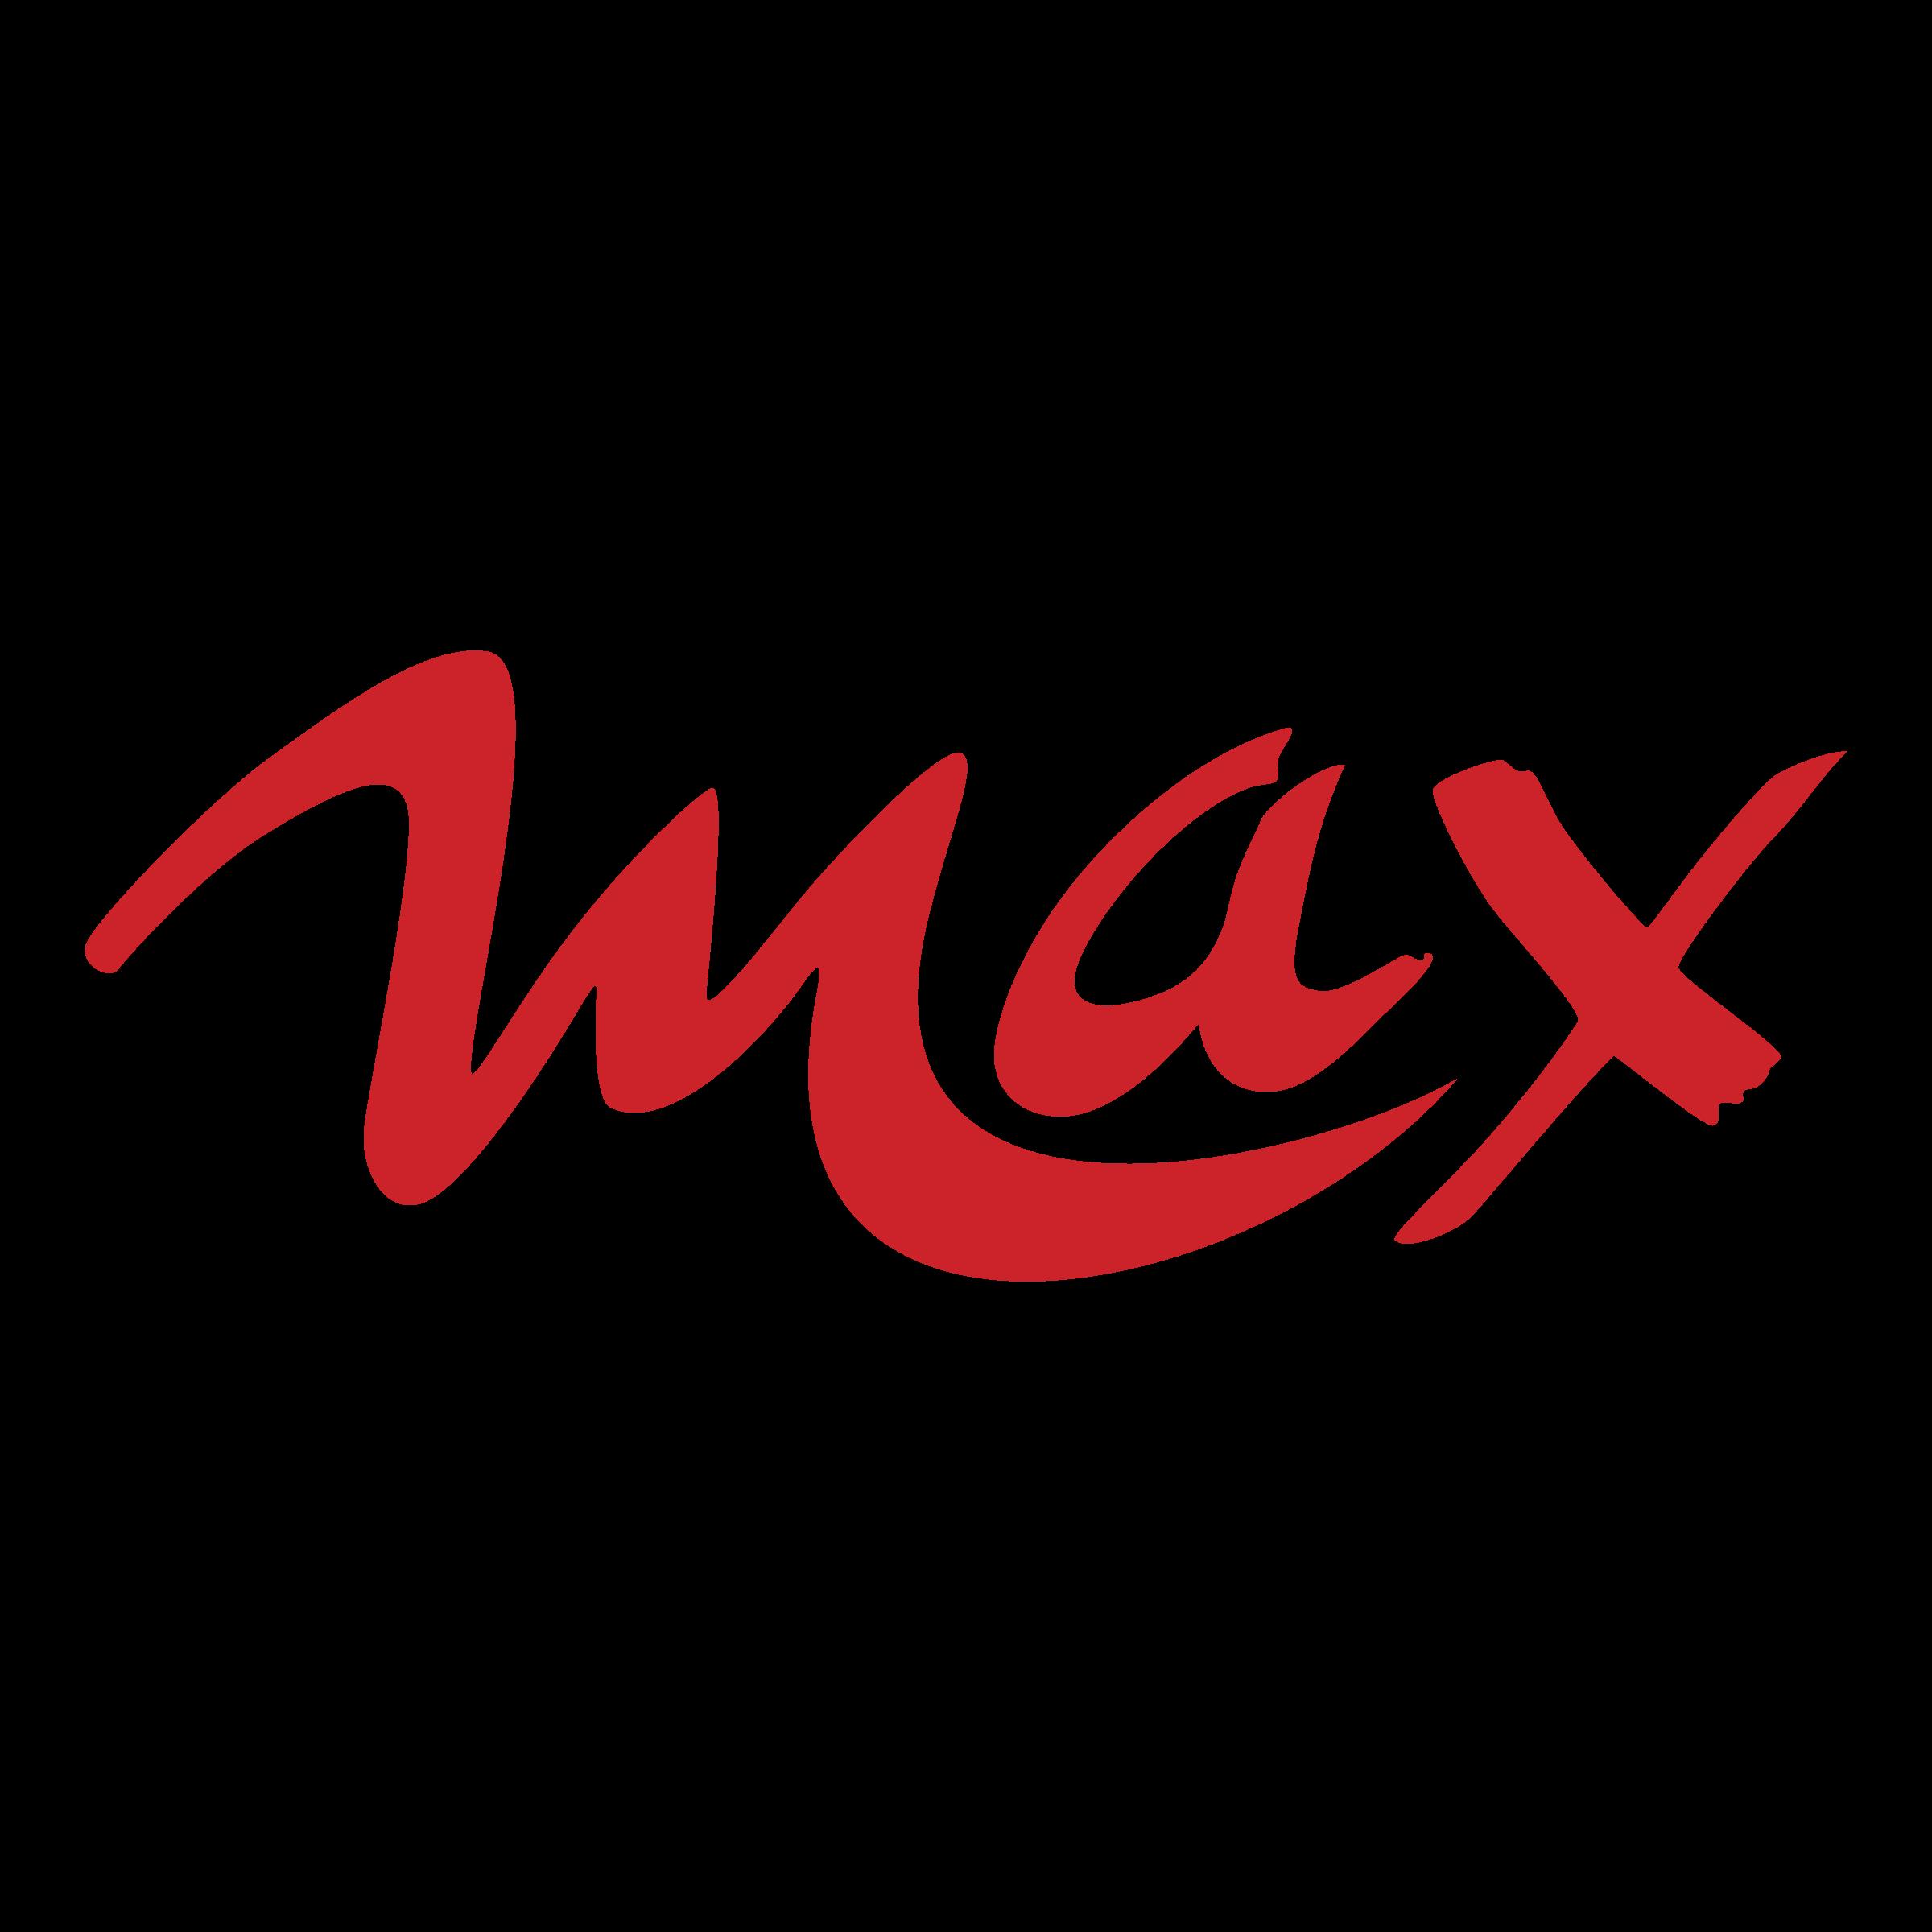 Max Logo Png Transparent Svg Vector Freebie Supply